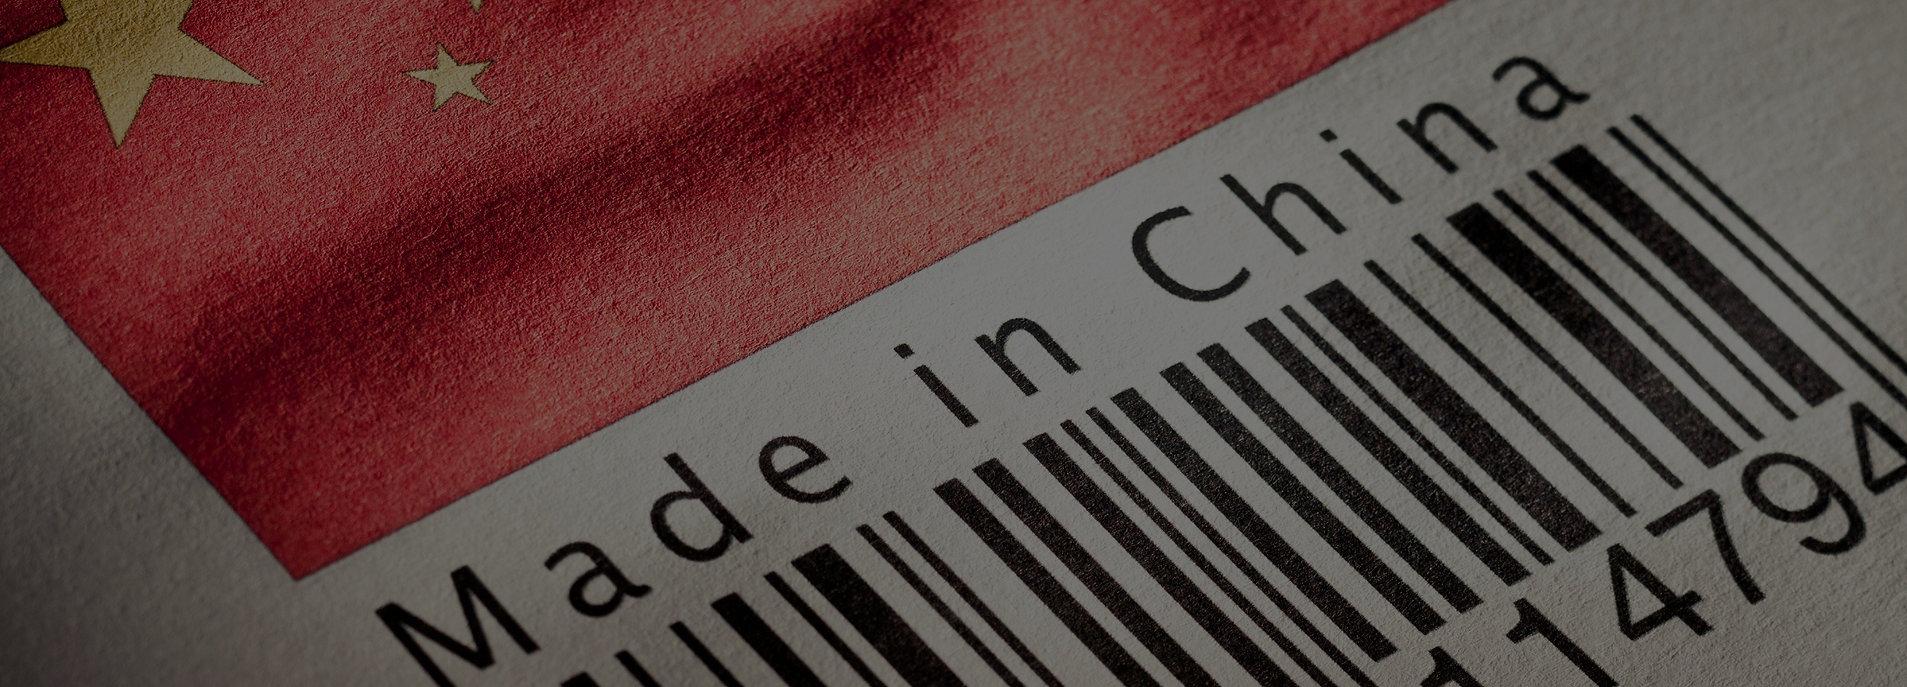 made-in-china-crop_edited_edited.jpg